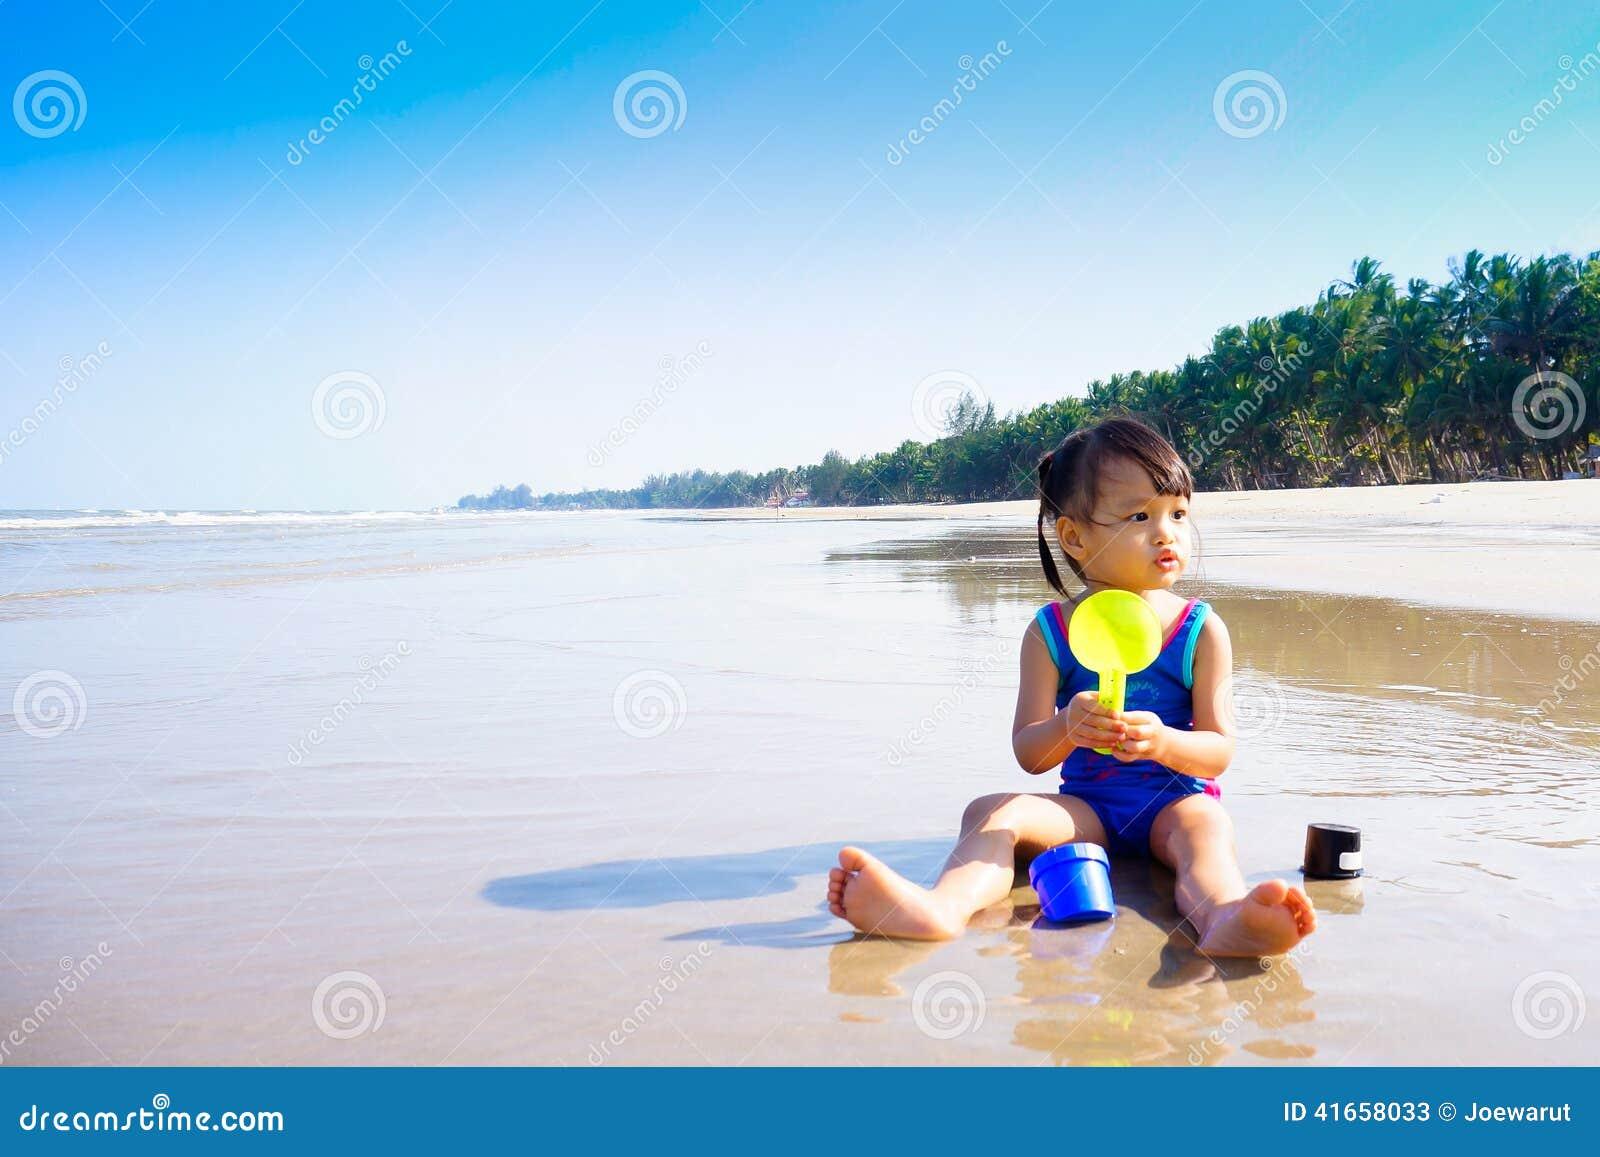 Каникула на пляже